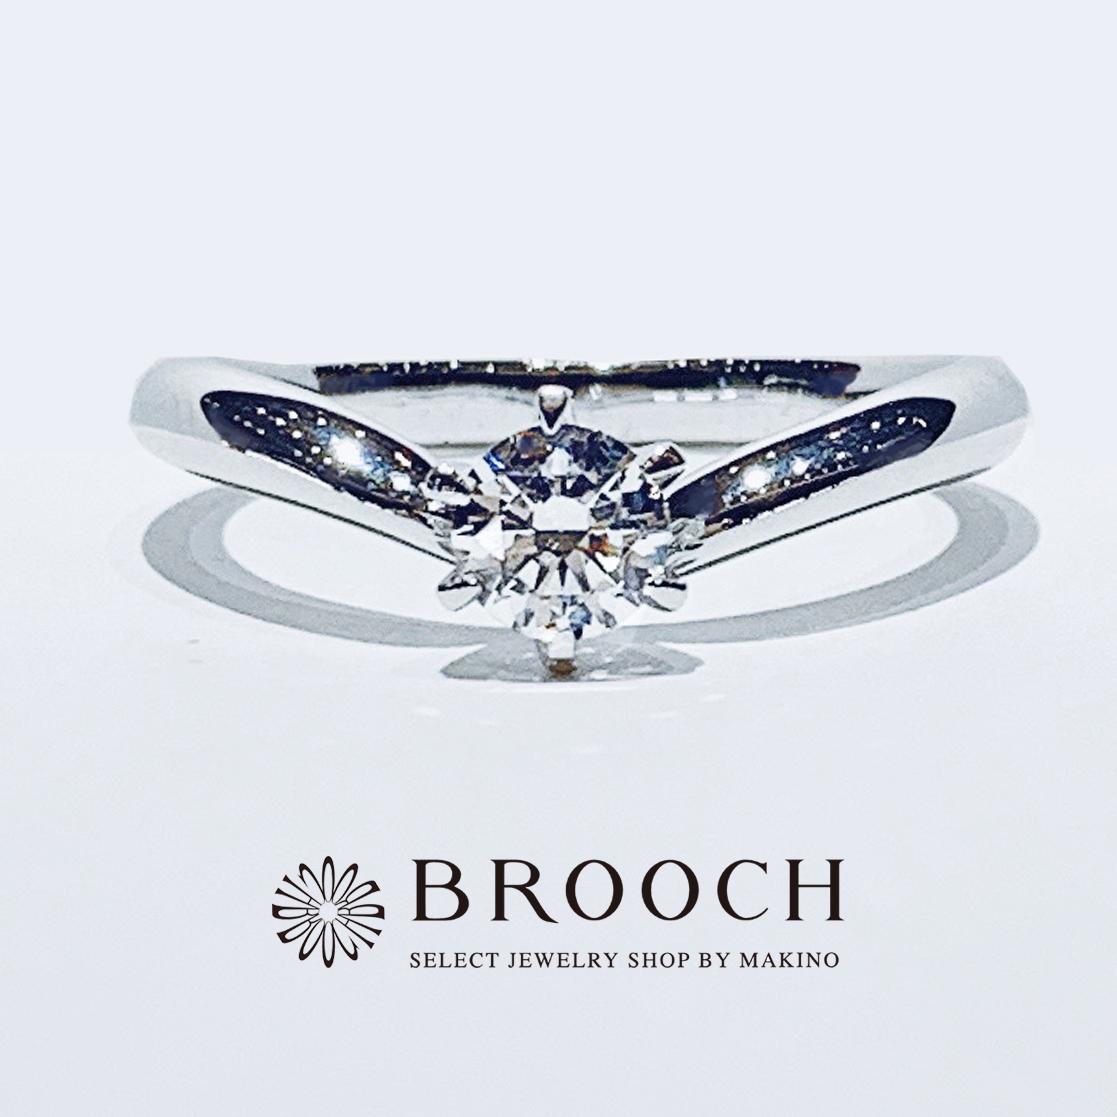 BROOCH 婚約指輪 エンゲージリング シンプル1石V字ライン